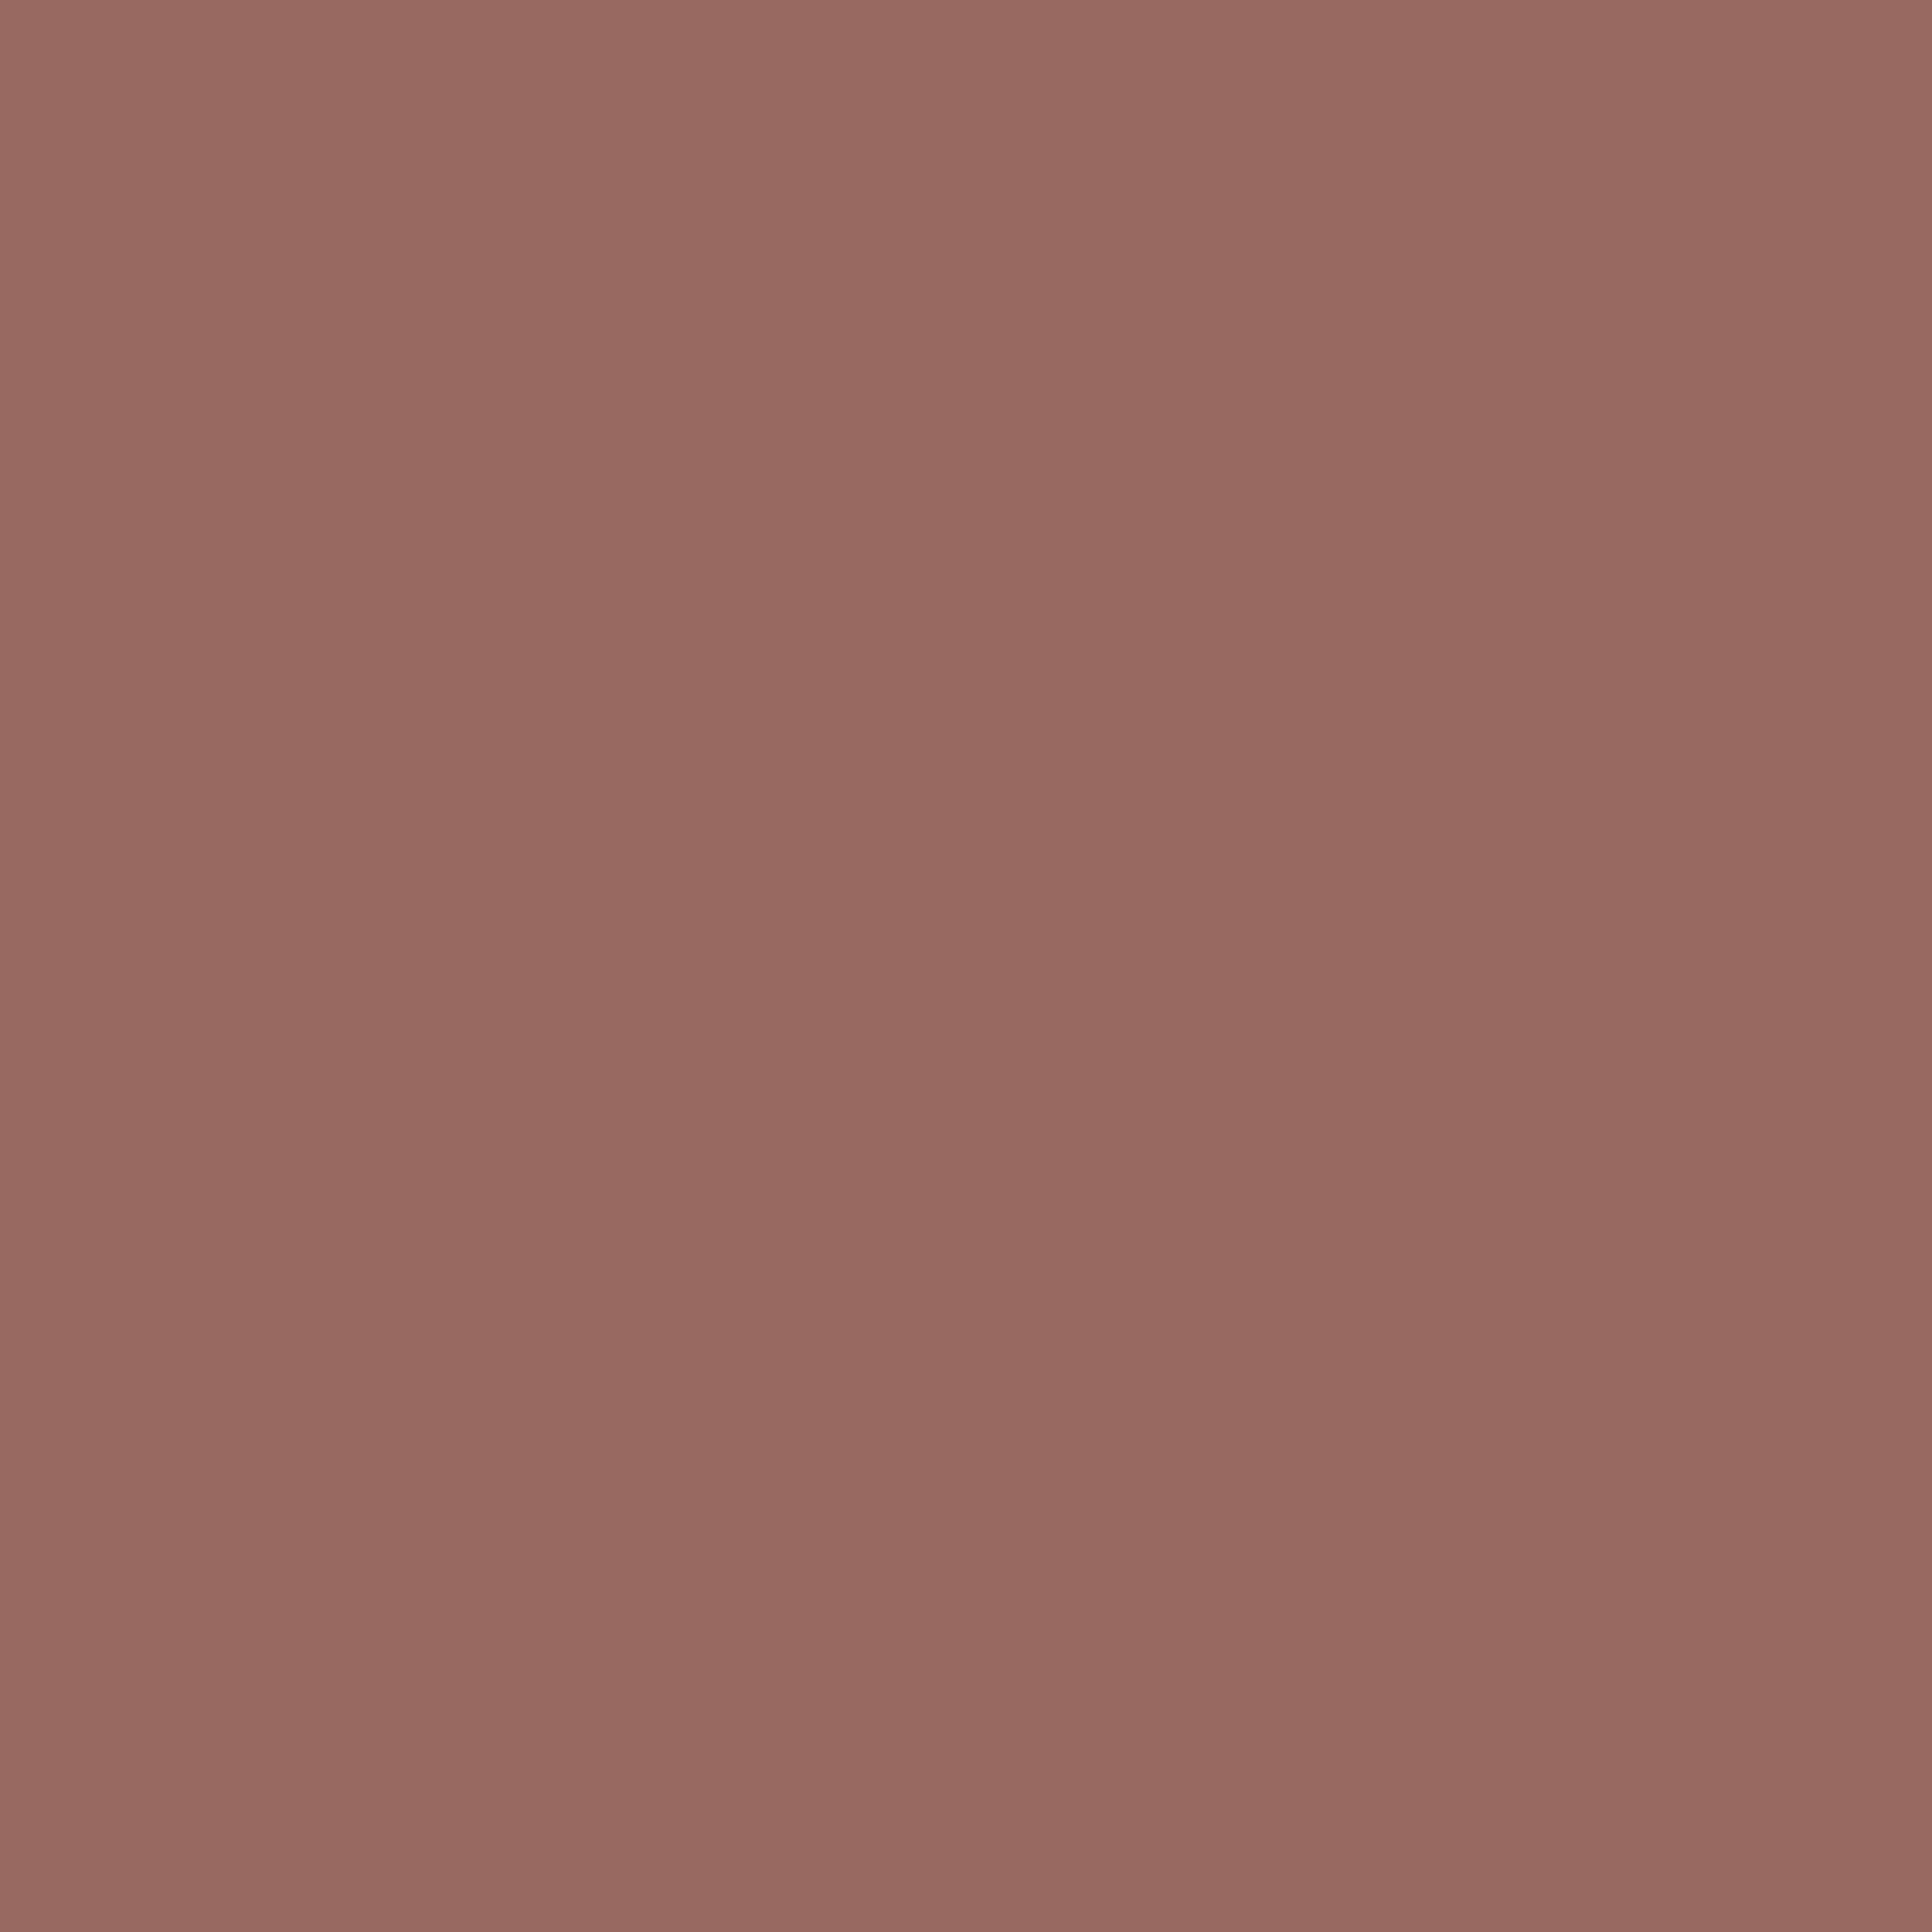 2732x2732 Dark Chestnut Solid Color Background